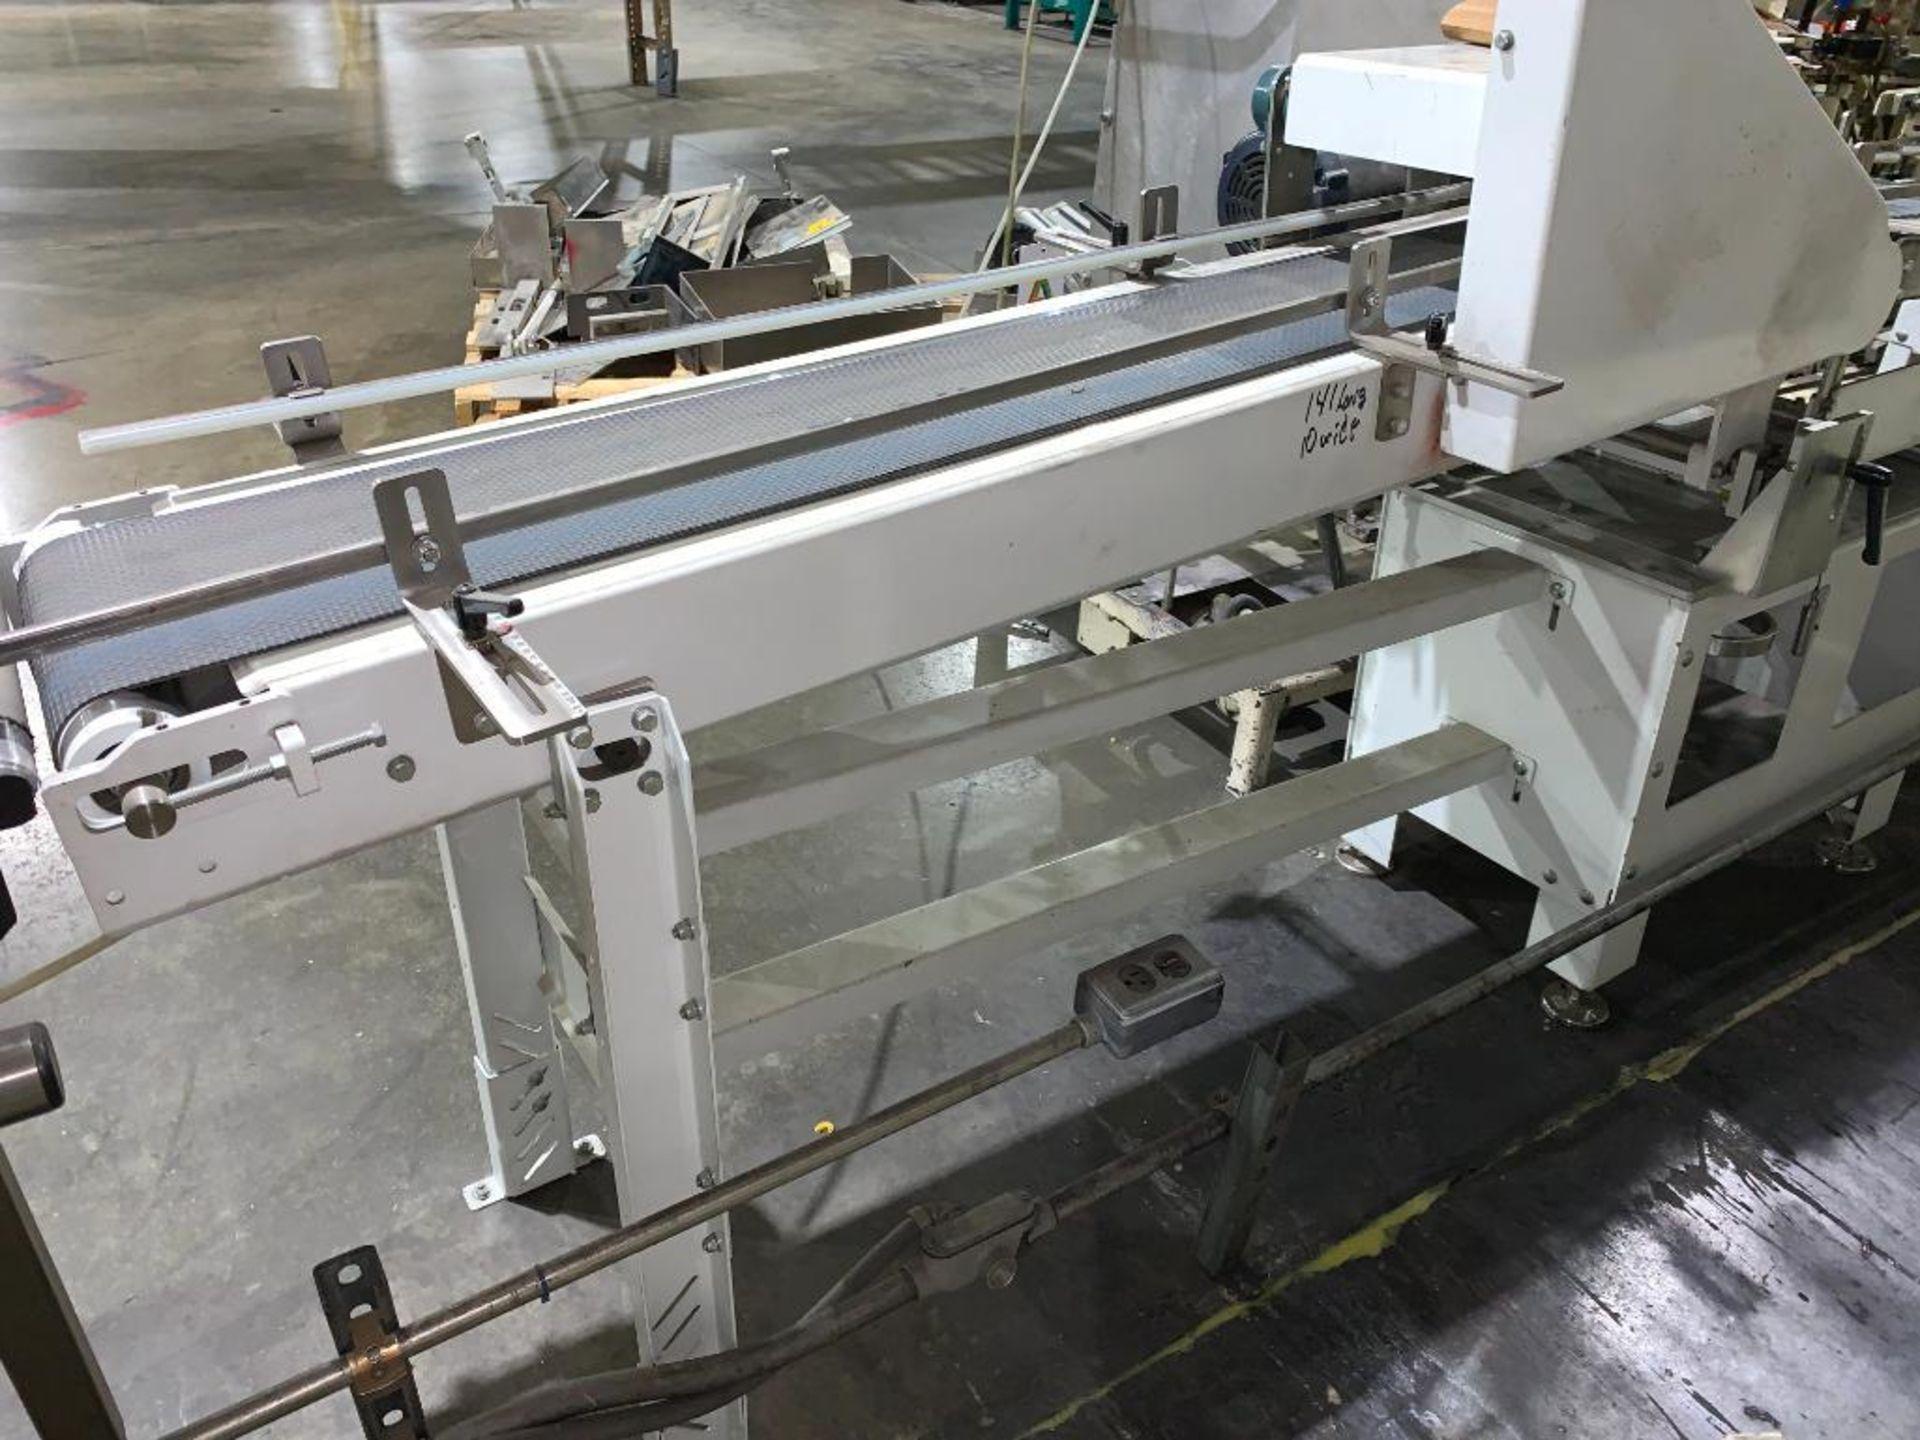 mild steel belt conveyor, 68 in. x 10 in., with box conditioner - Image 5 of 13